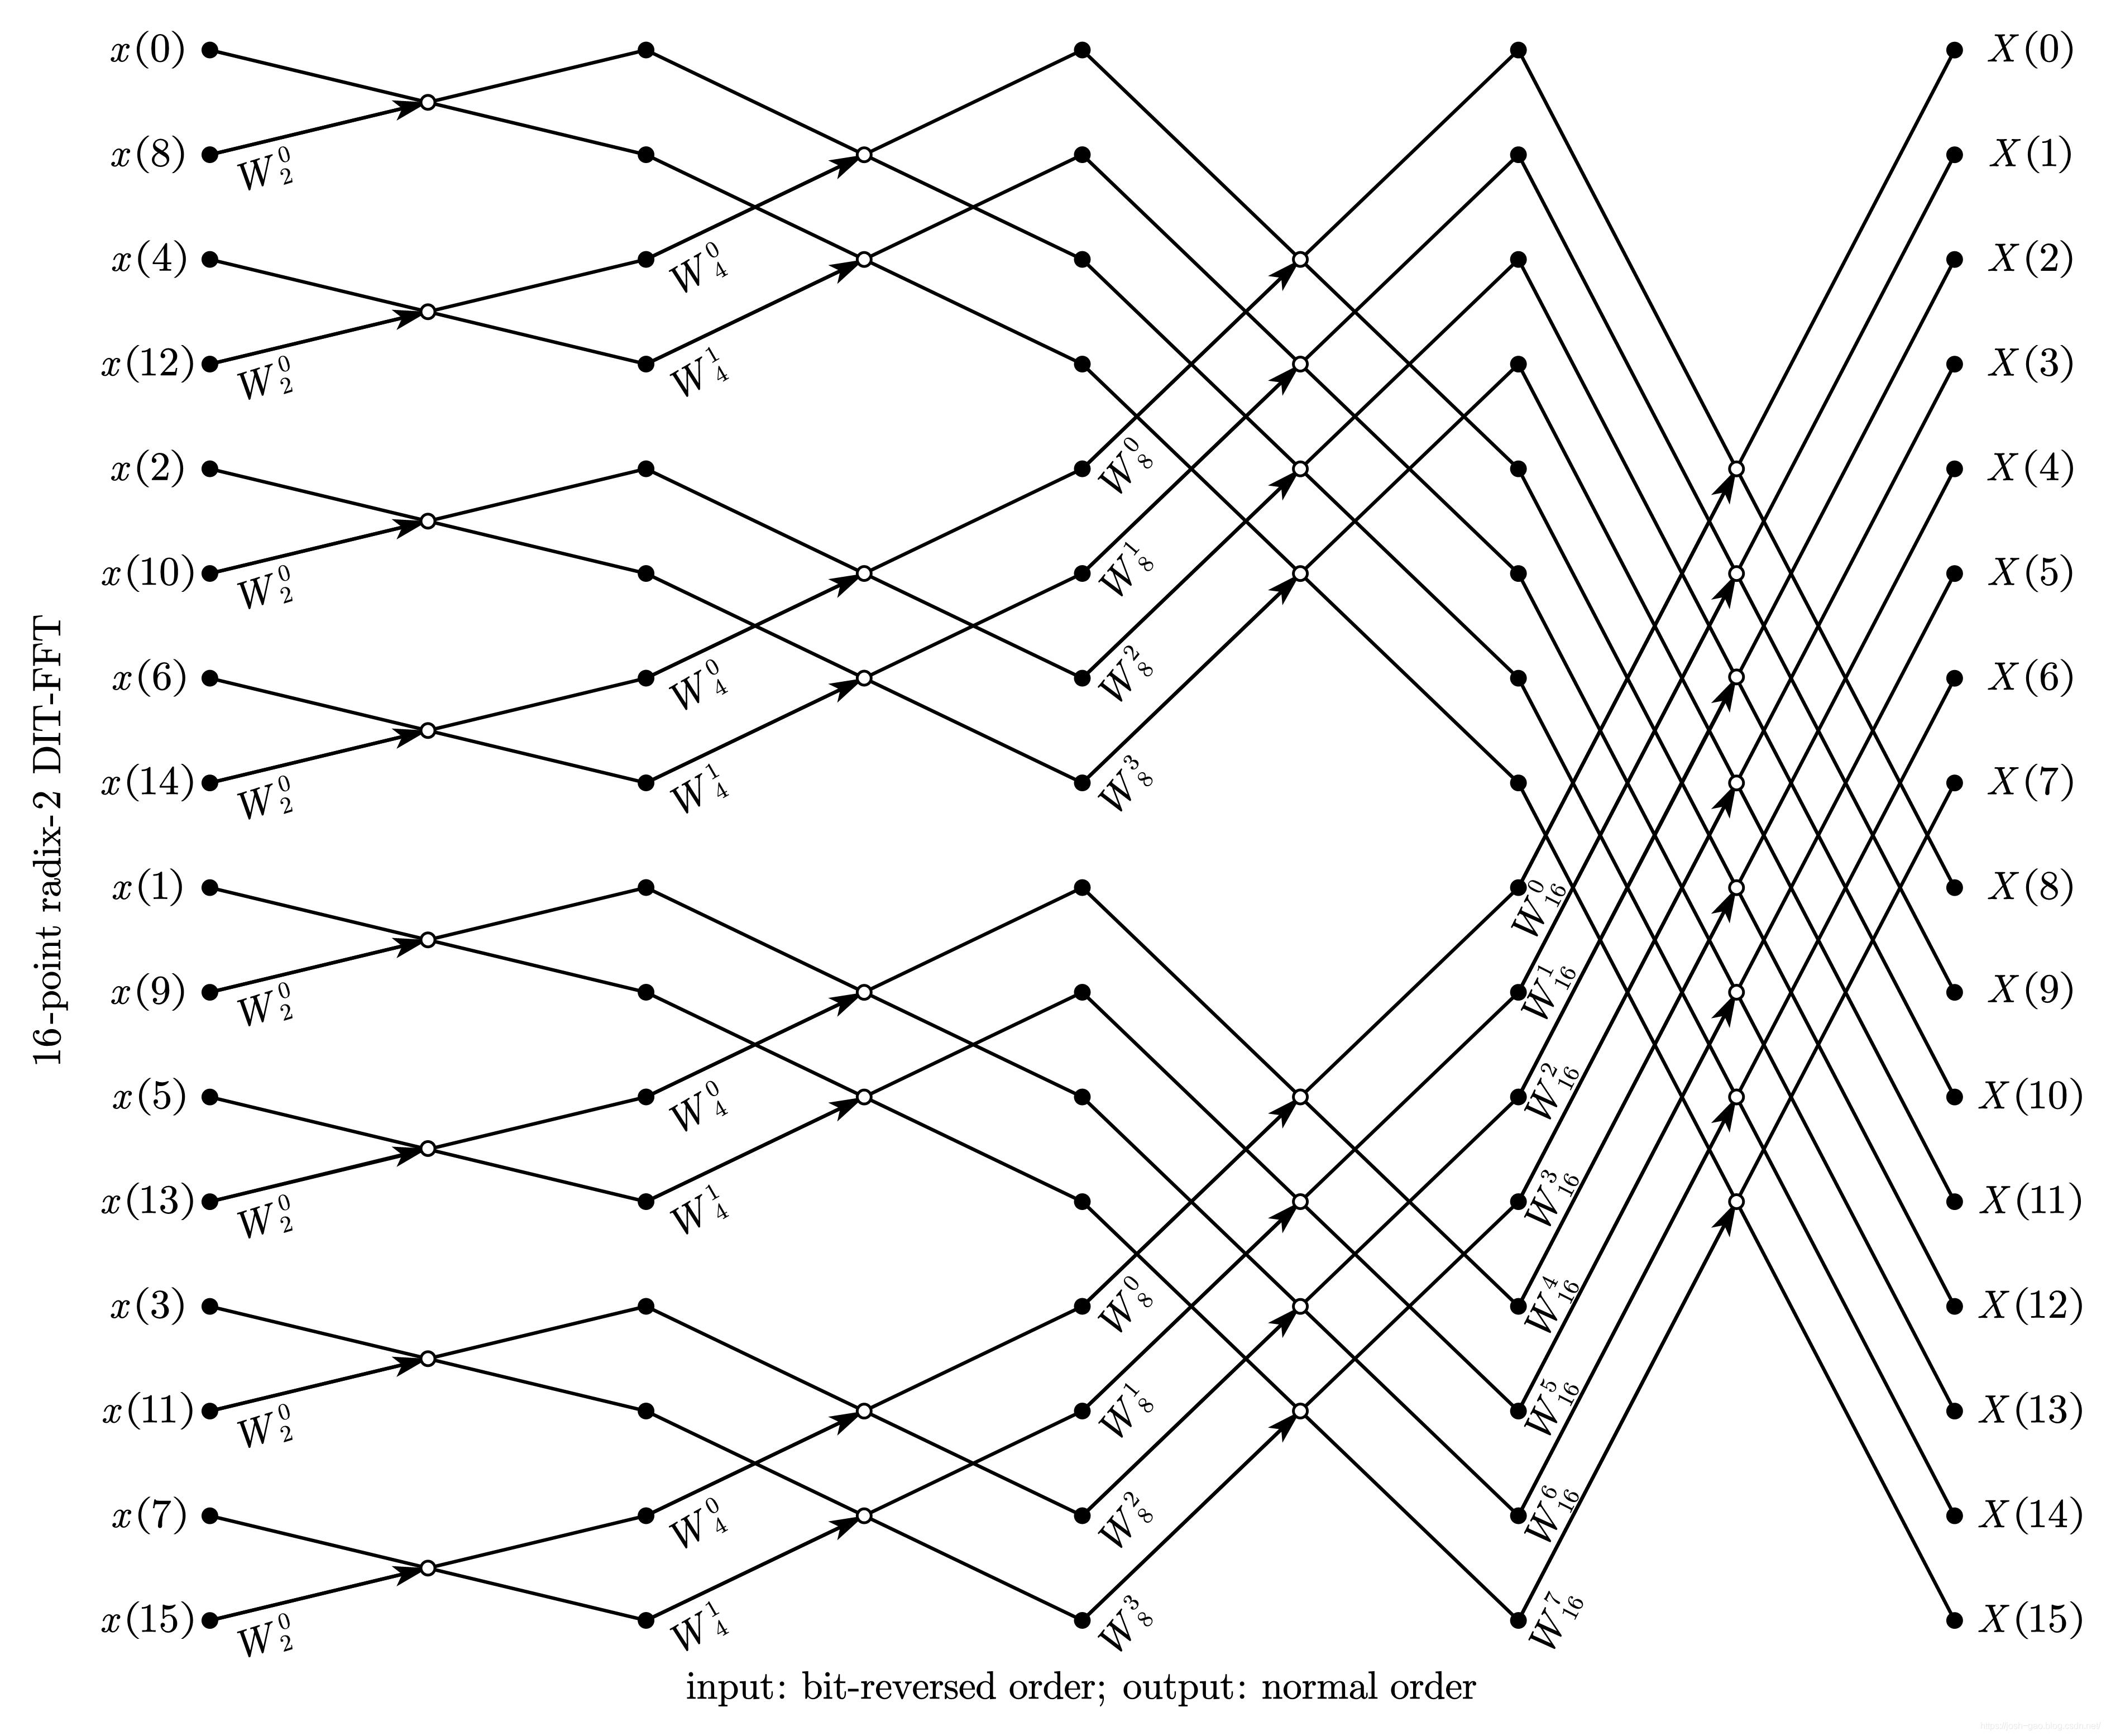 16-point radix-2 DIT-FFT 比特位反序输入、自然顺序输出